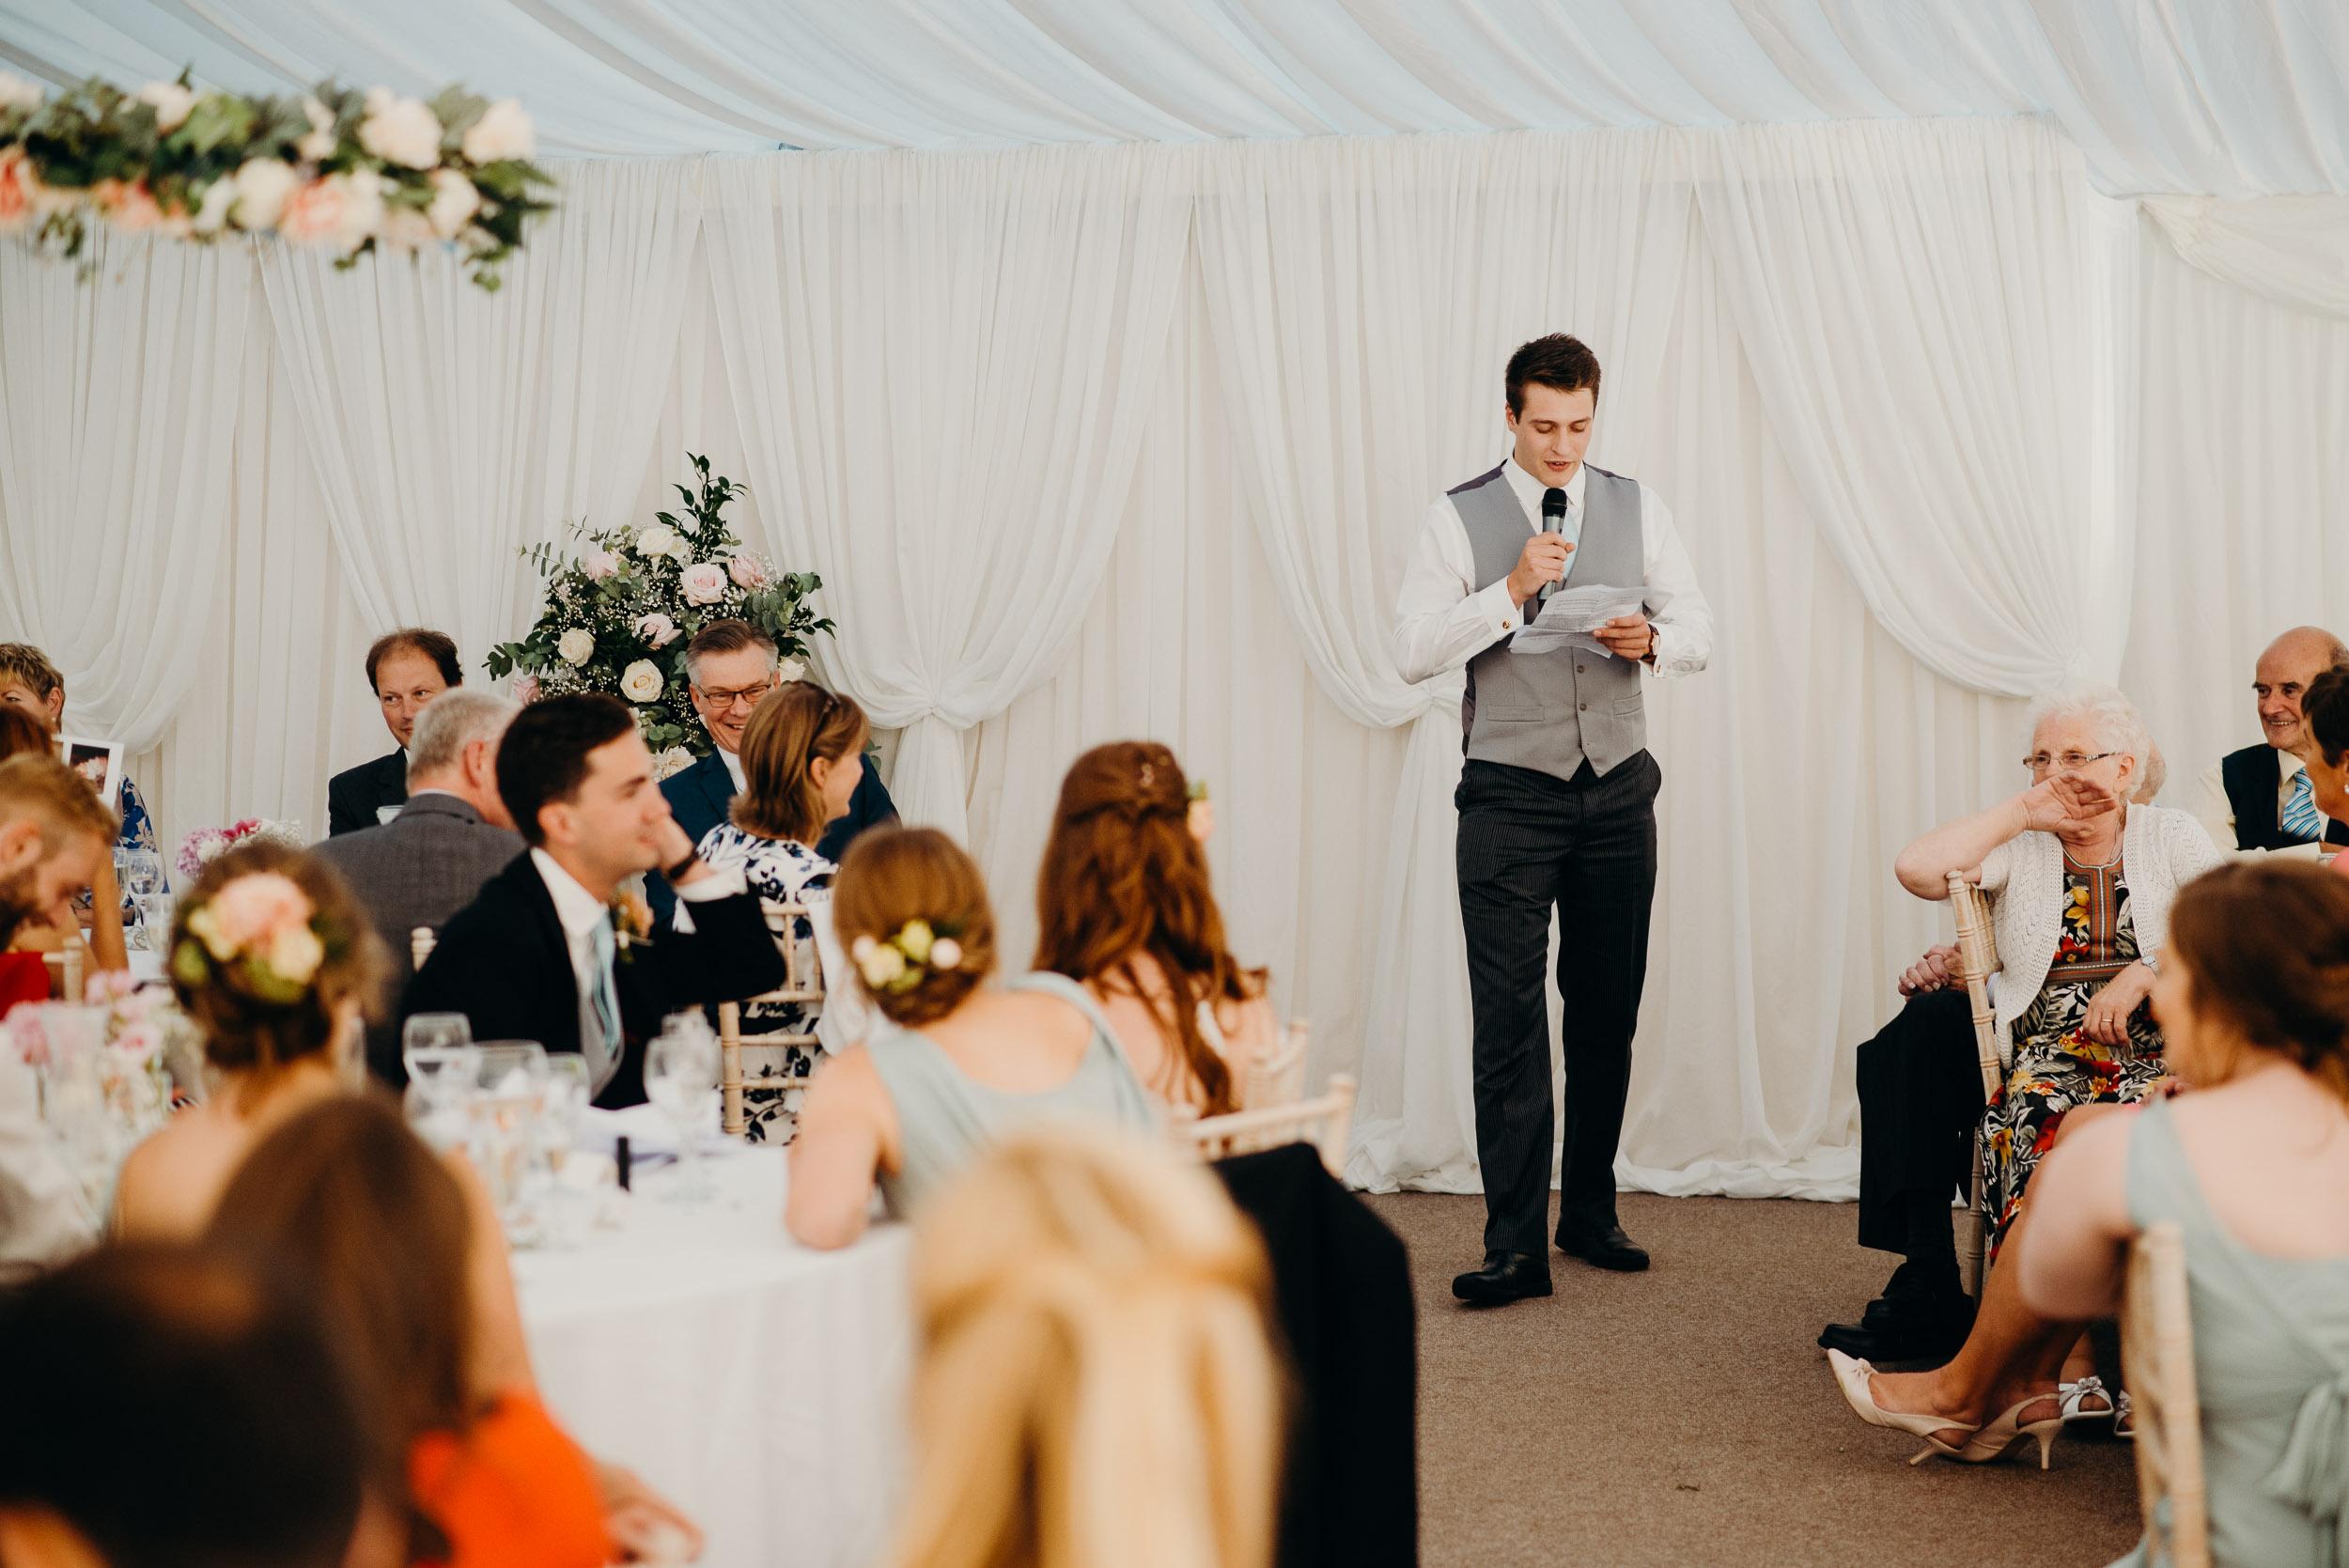 drenagh estate wedding photography-115.jpg